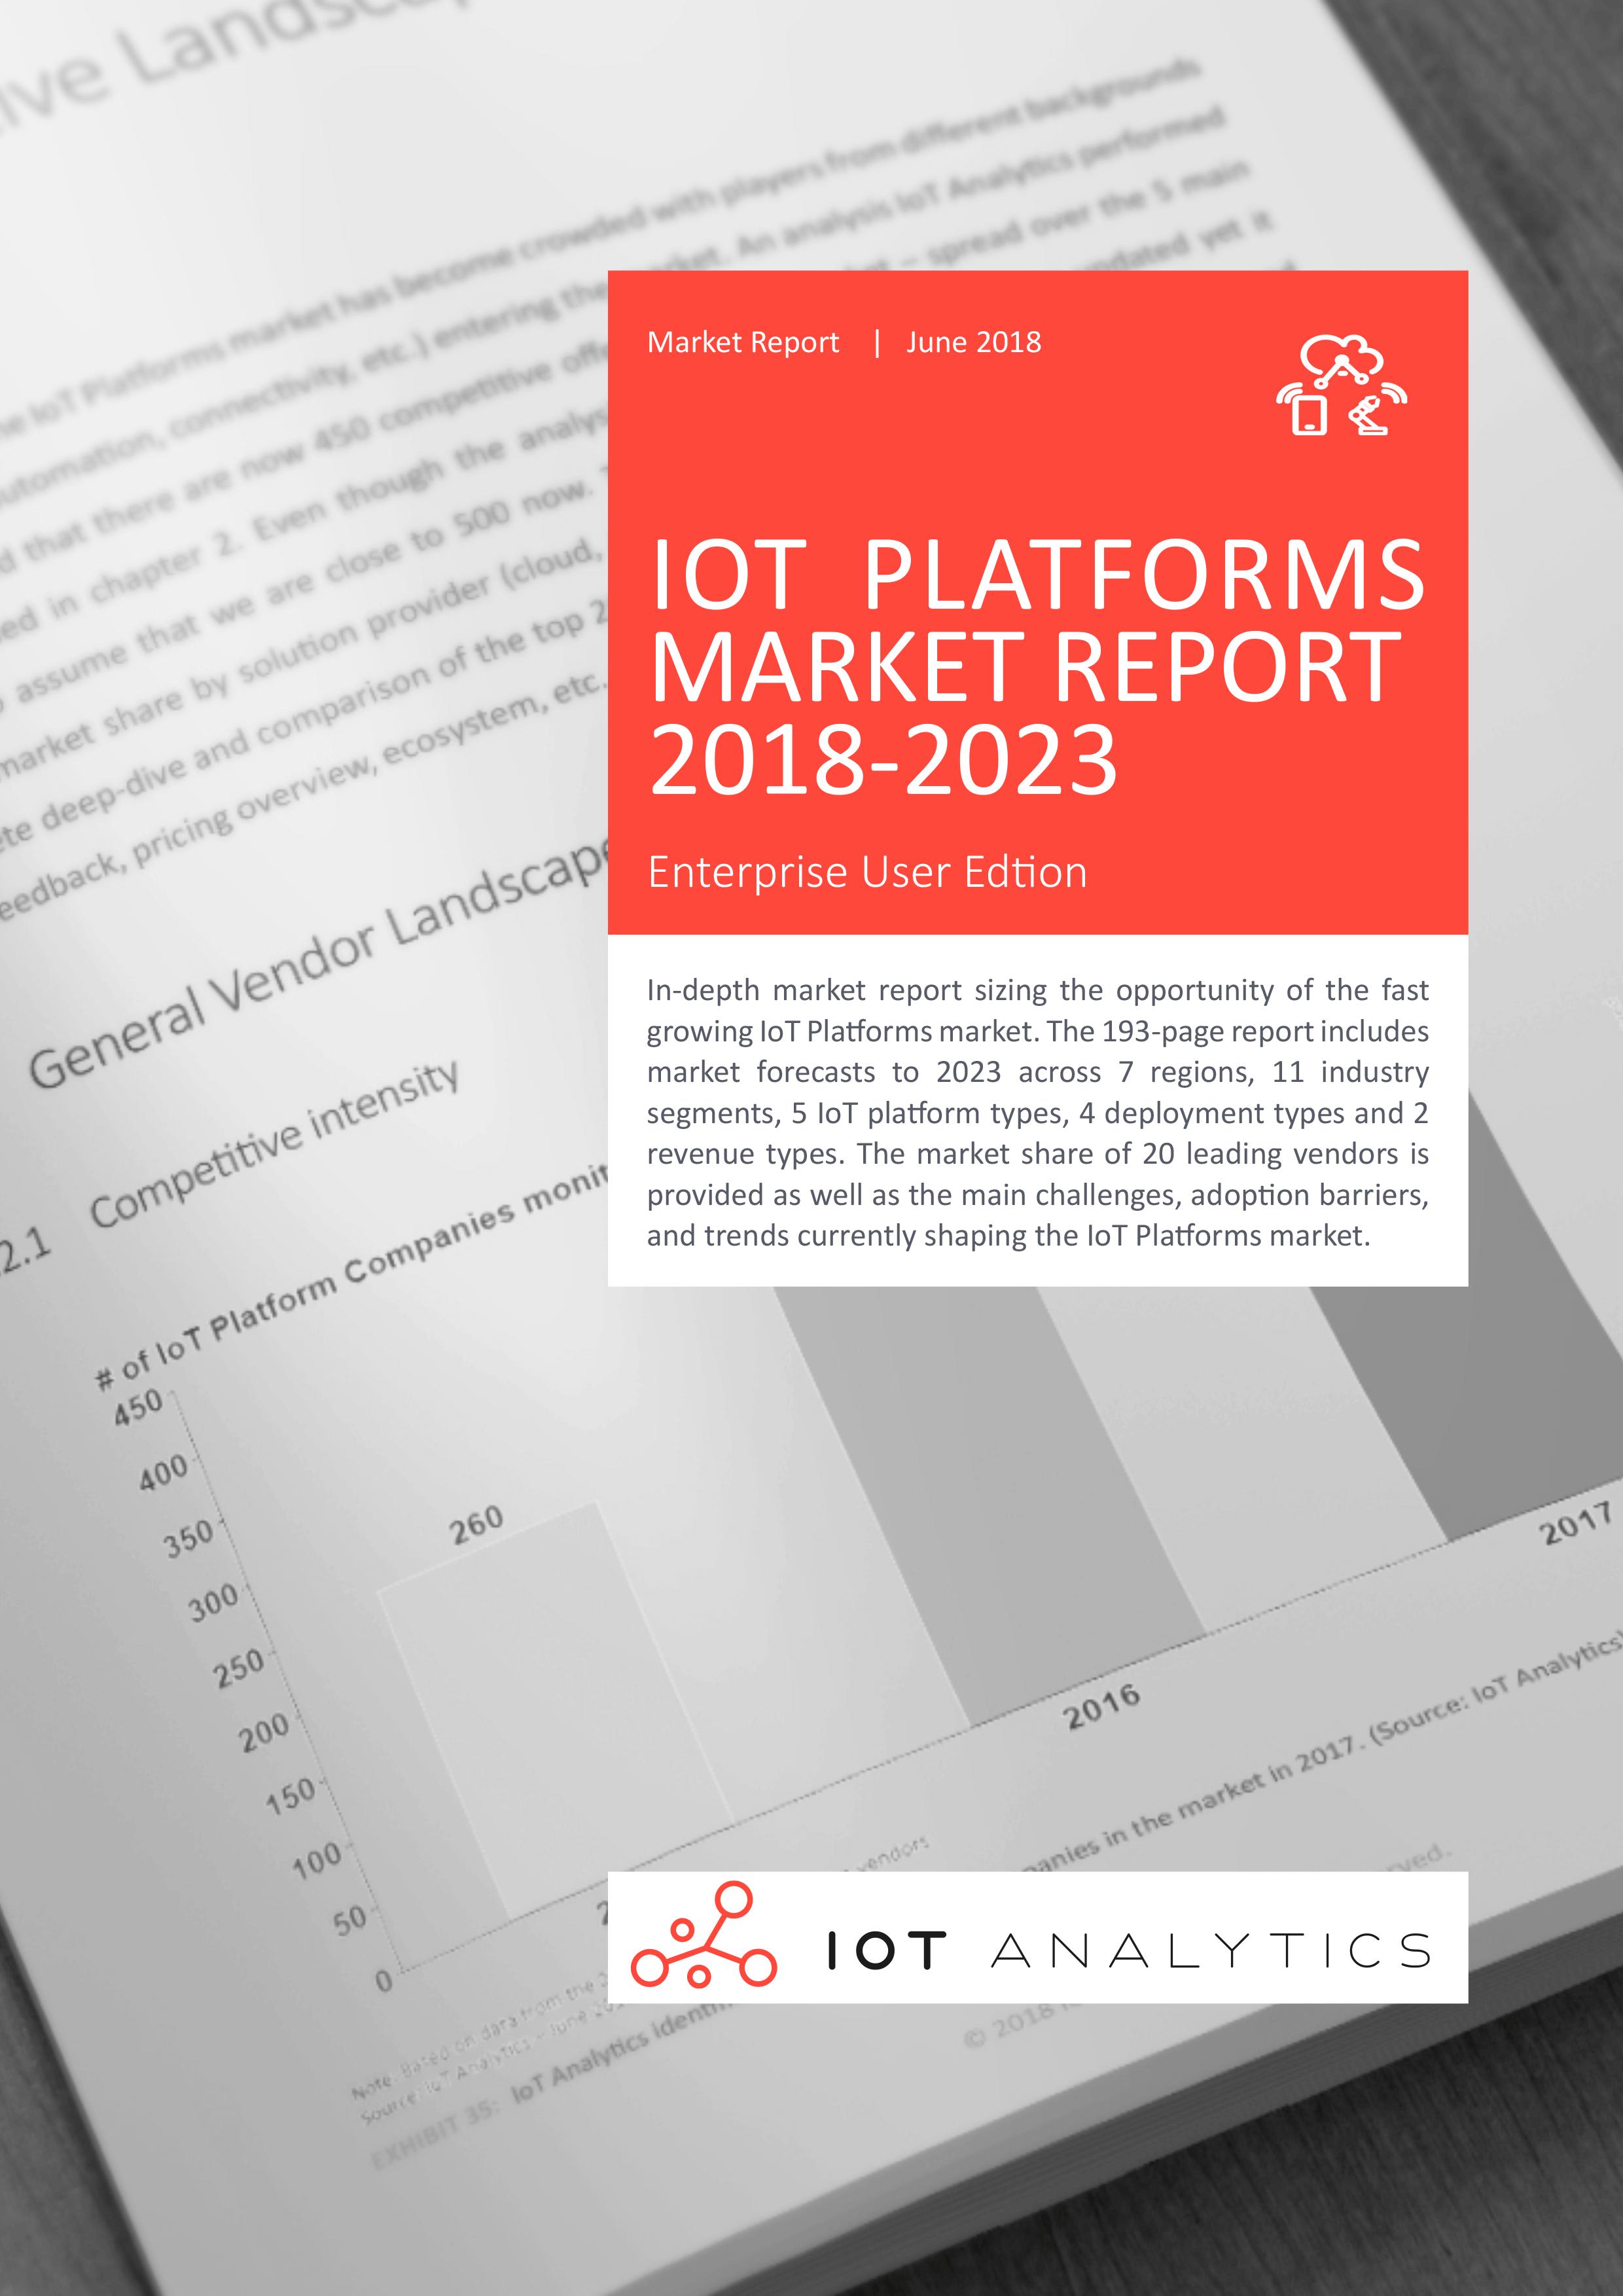 IoT Platforms Market Cover Image